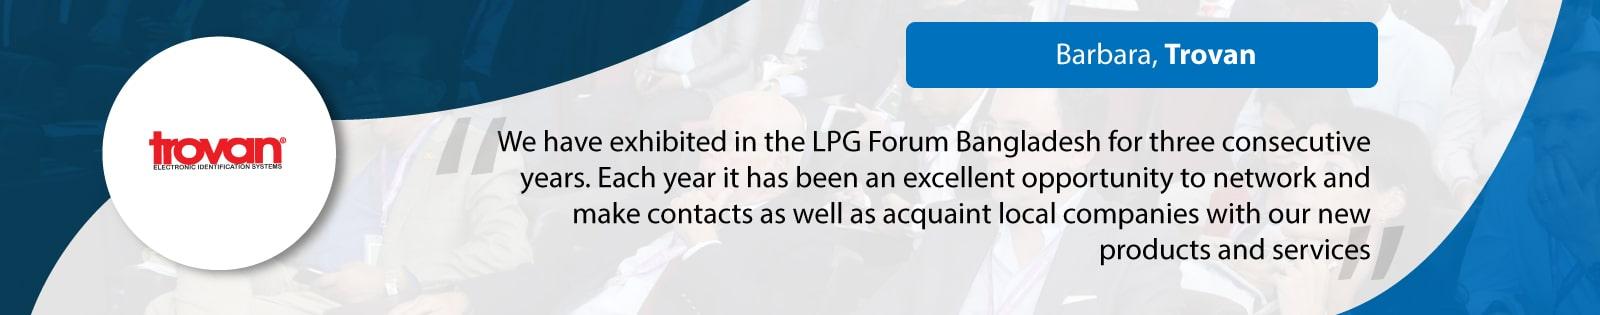 Home - 6th Africa LPG Summit 2019